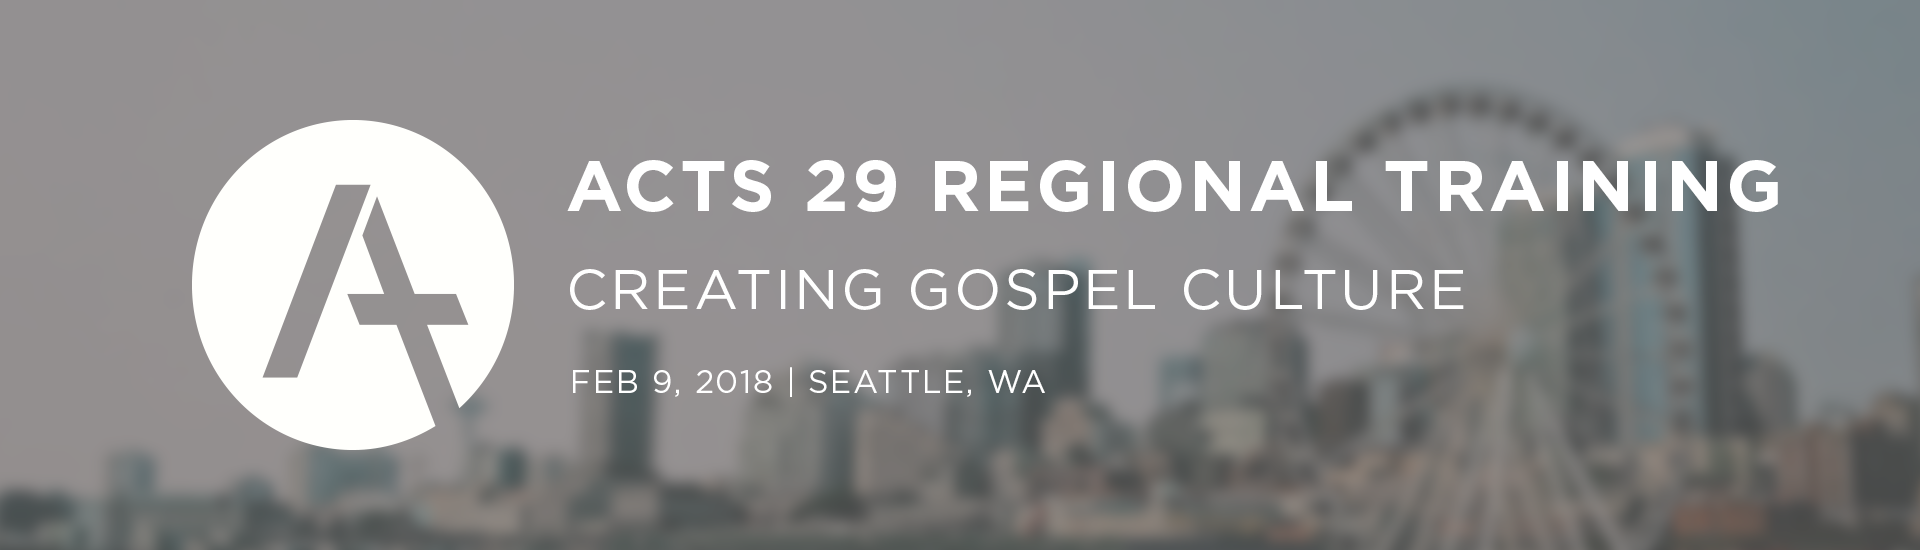 Creating Gospel Culture: Acts 29 Training